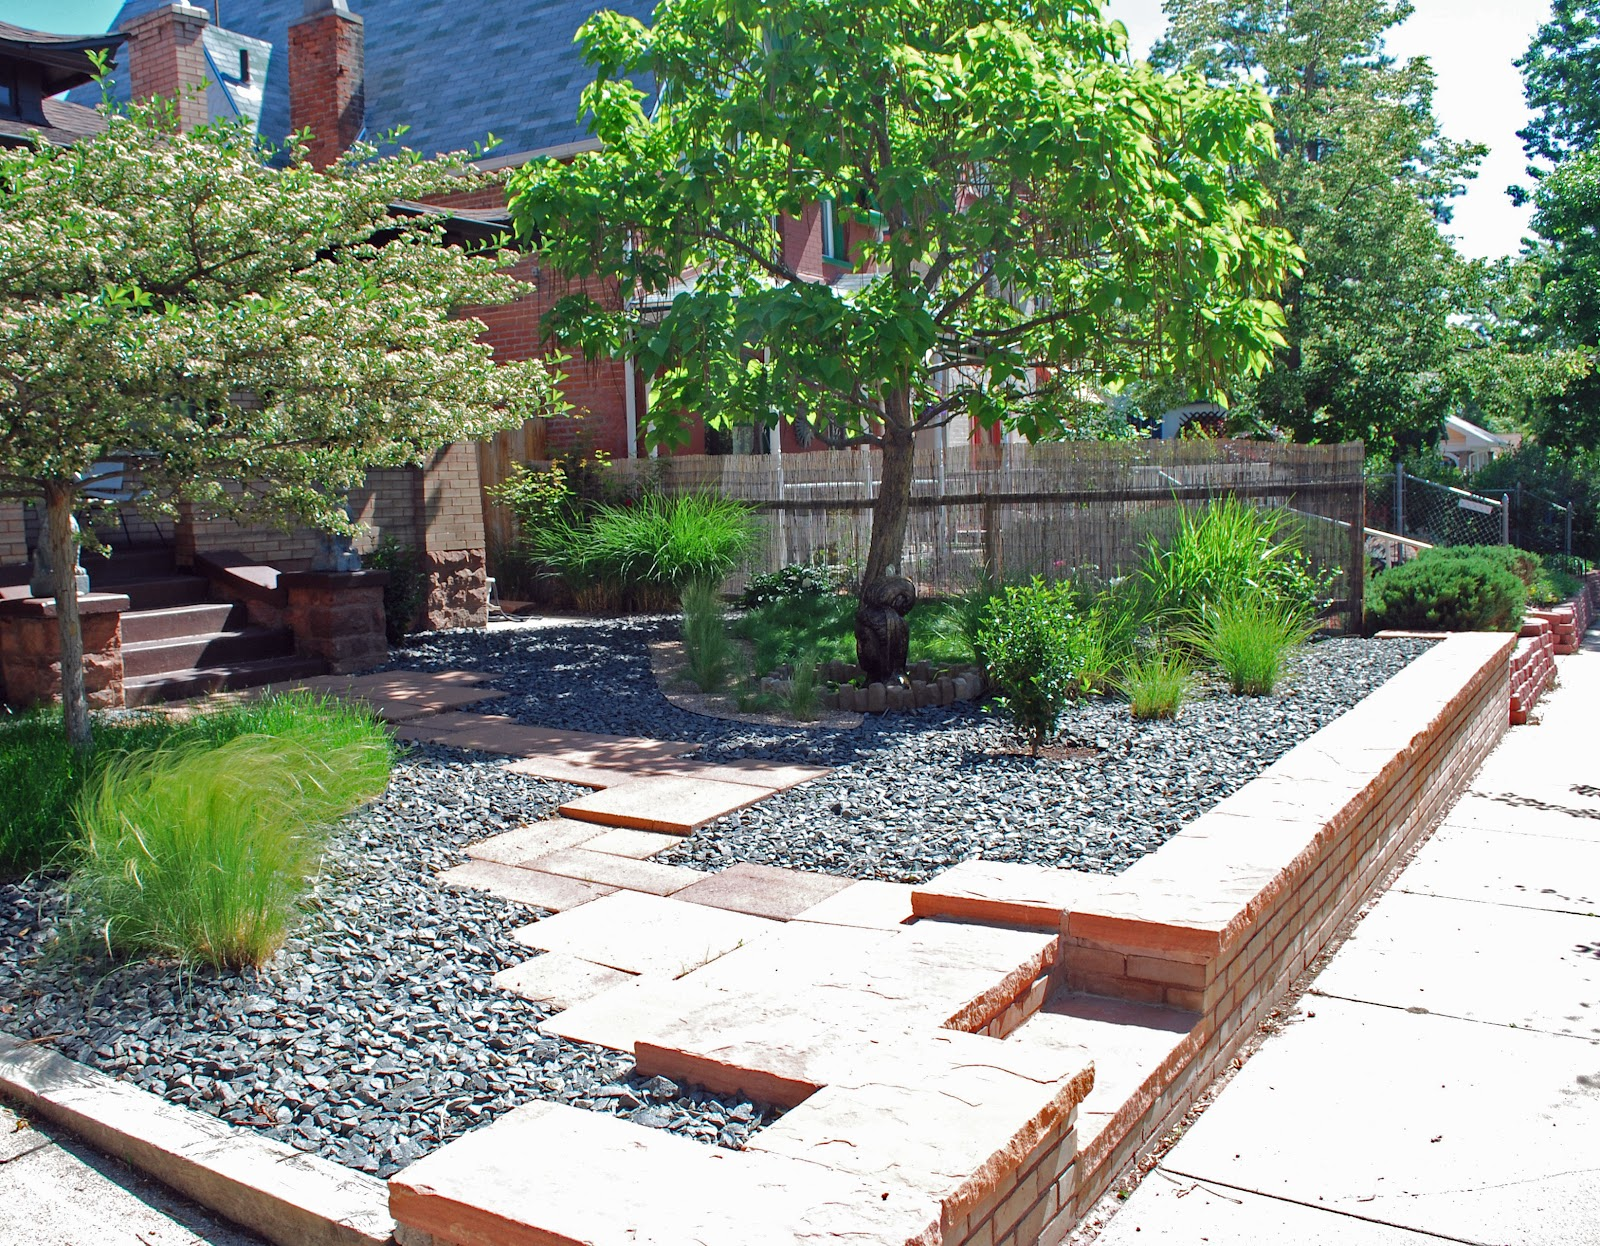 Landscape Design Focus: Low Maintenance | Garden Share Bristol